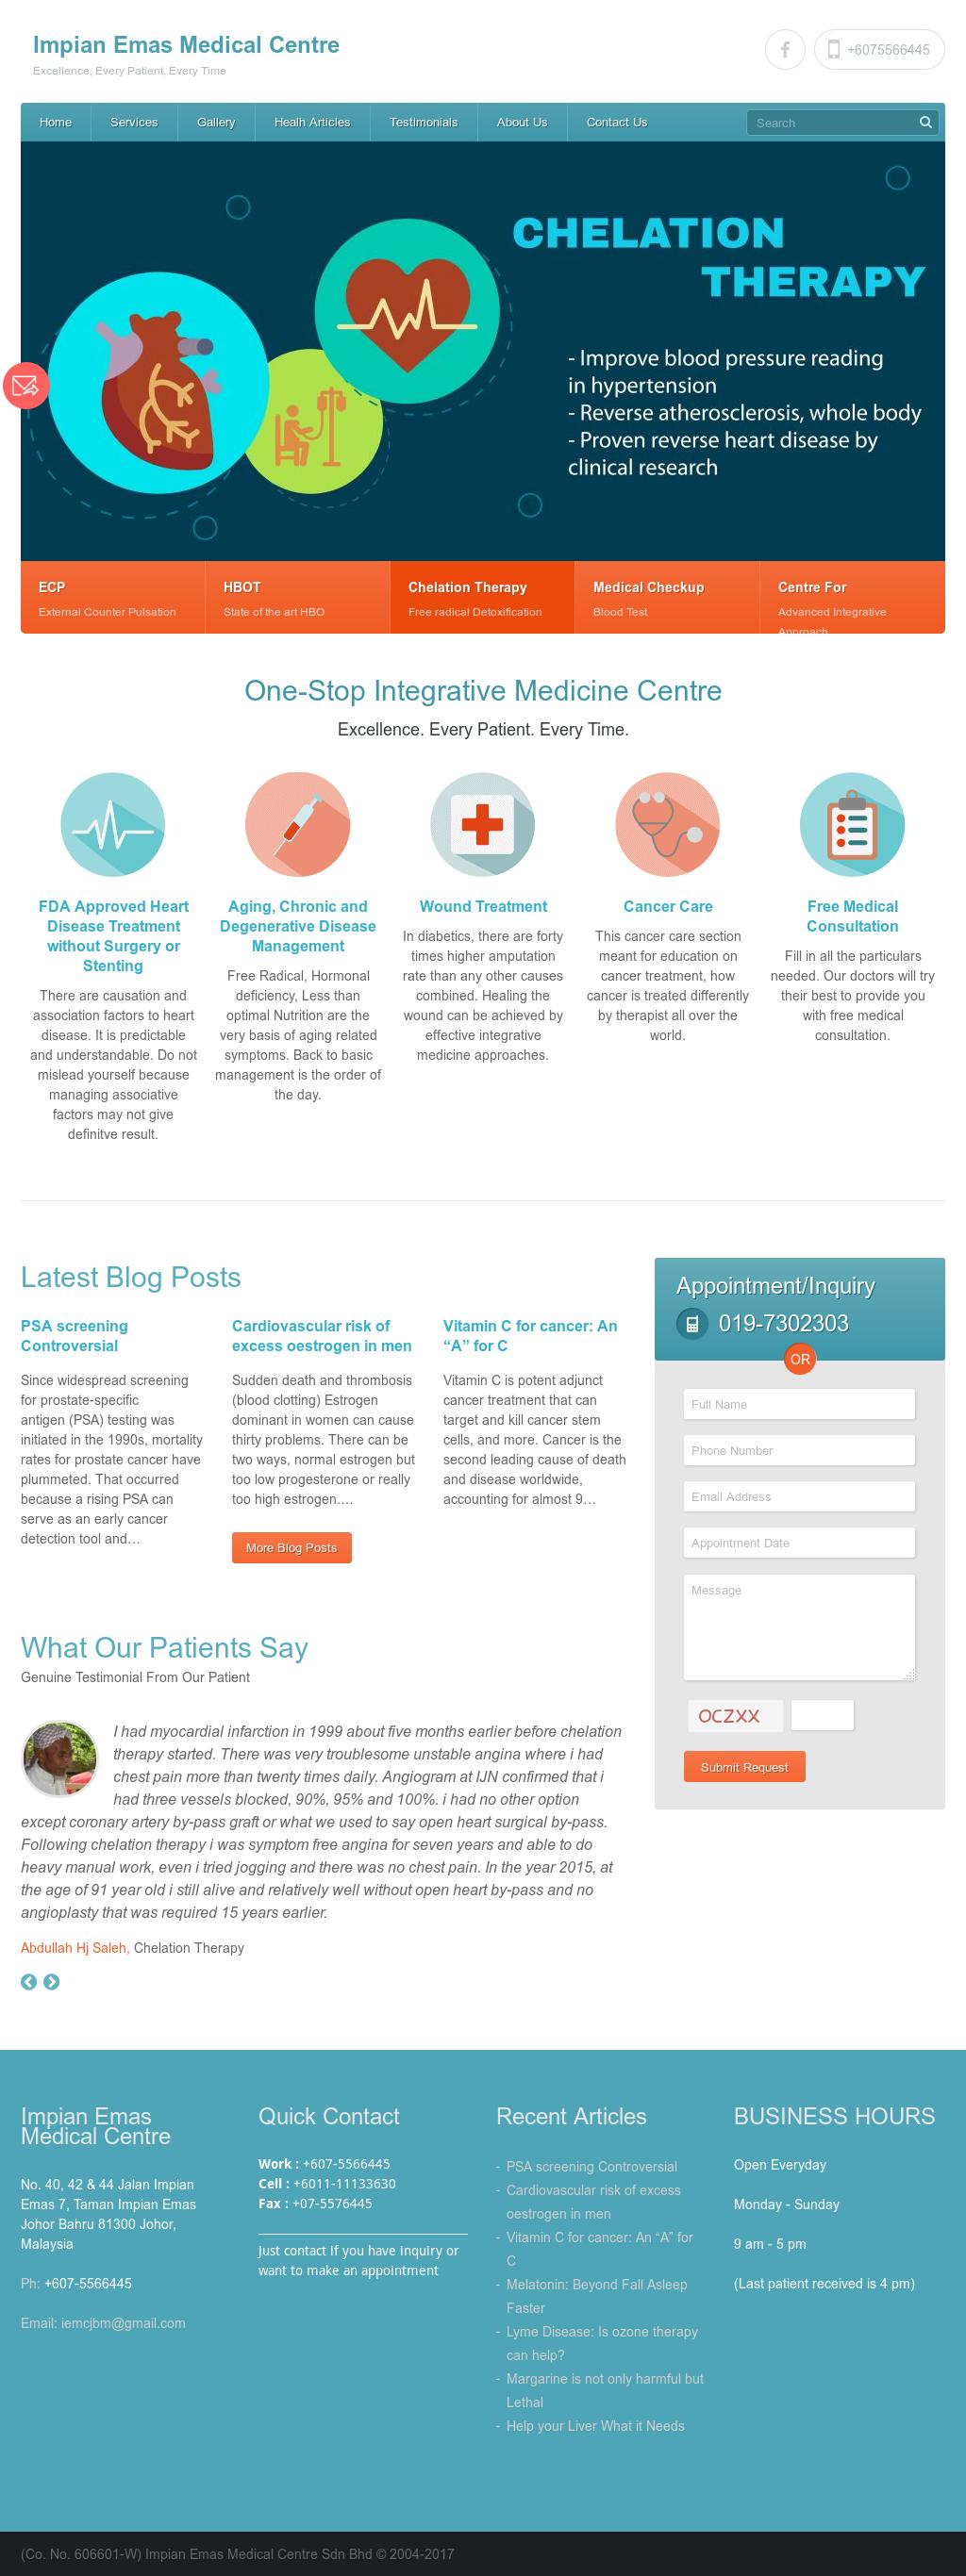 Owler Reports - Impian Emas Medical Centre Blog Anti